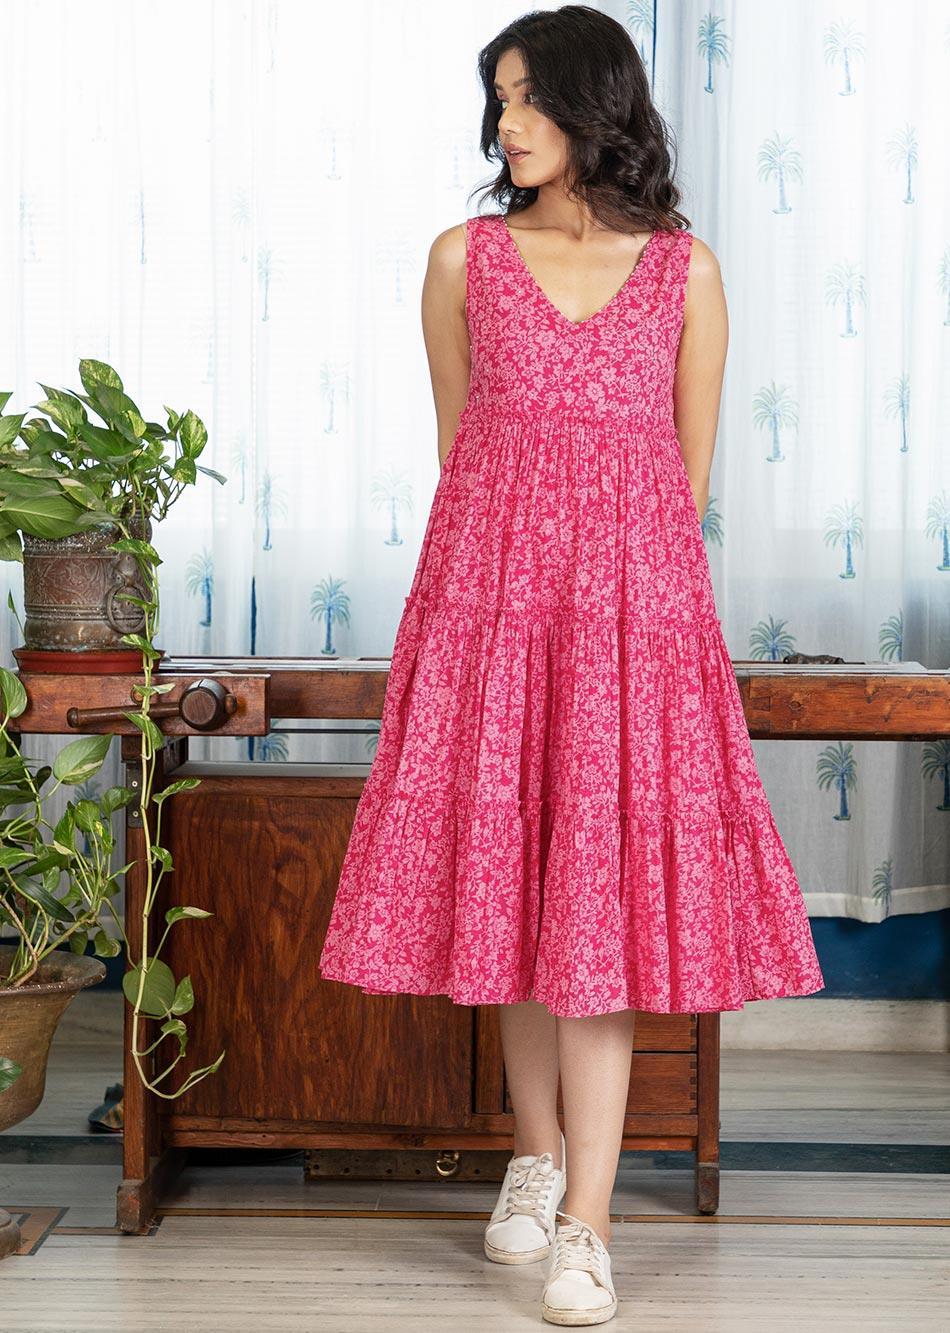 PINK WINK DRESS